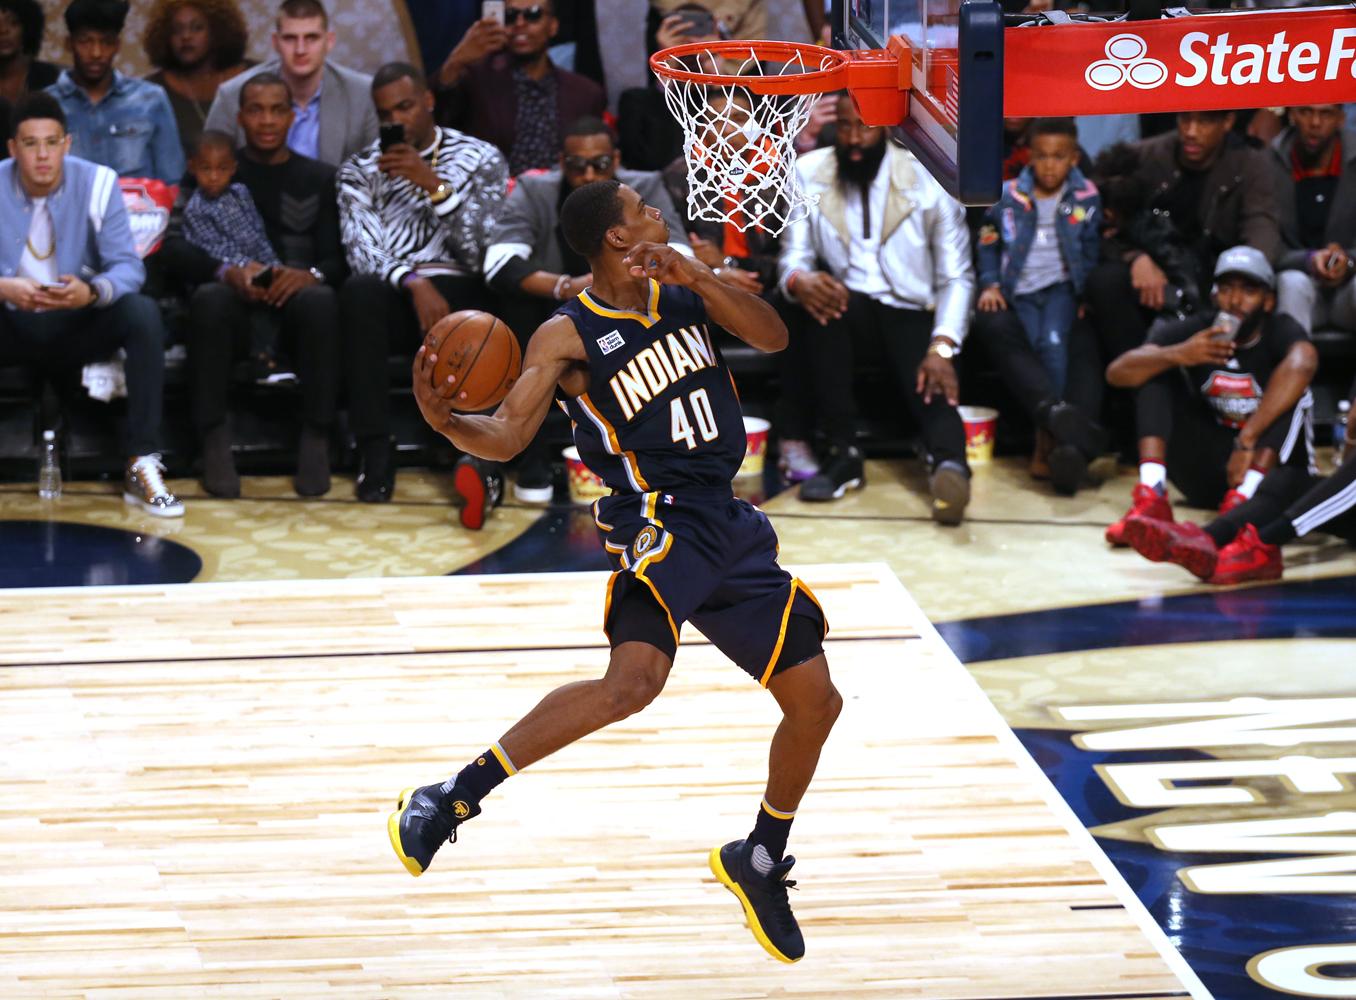 Worn by Glenn Robinson III during the NBA Dunk contest